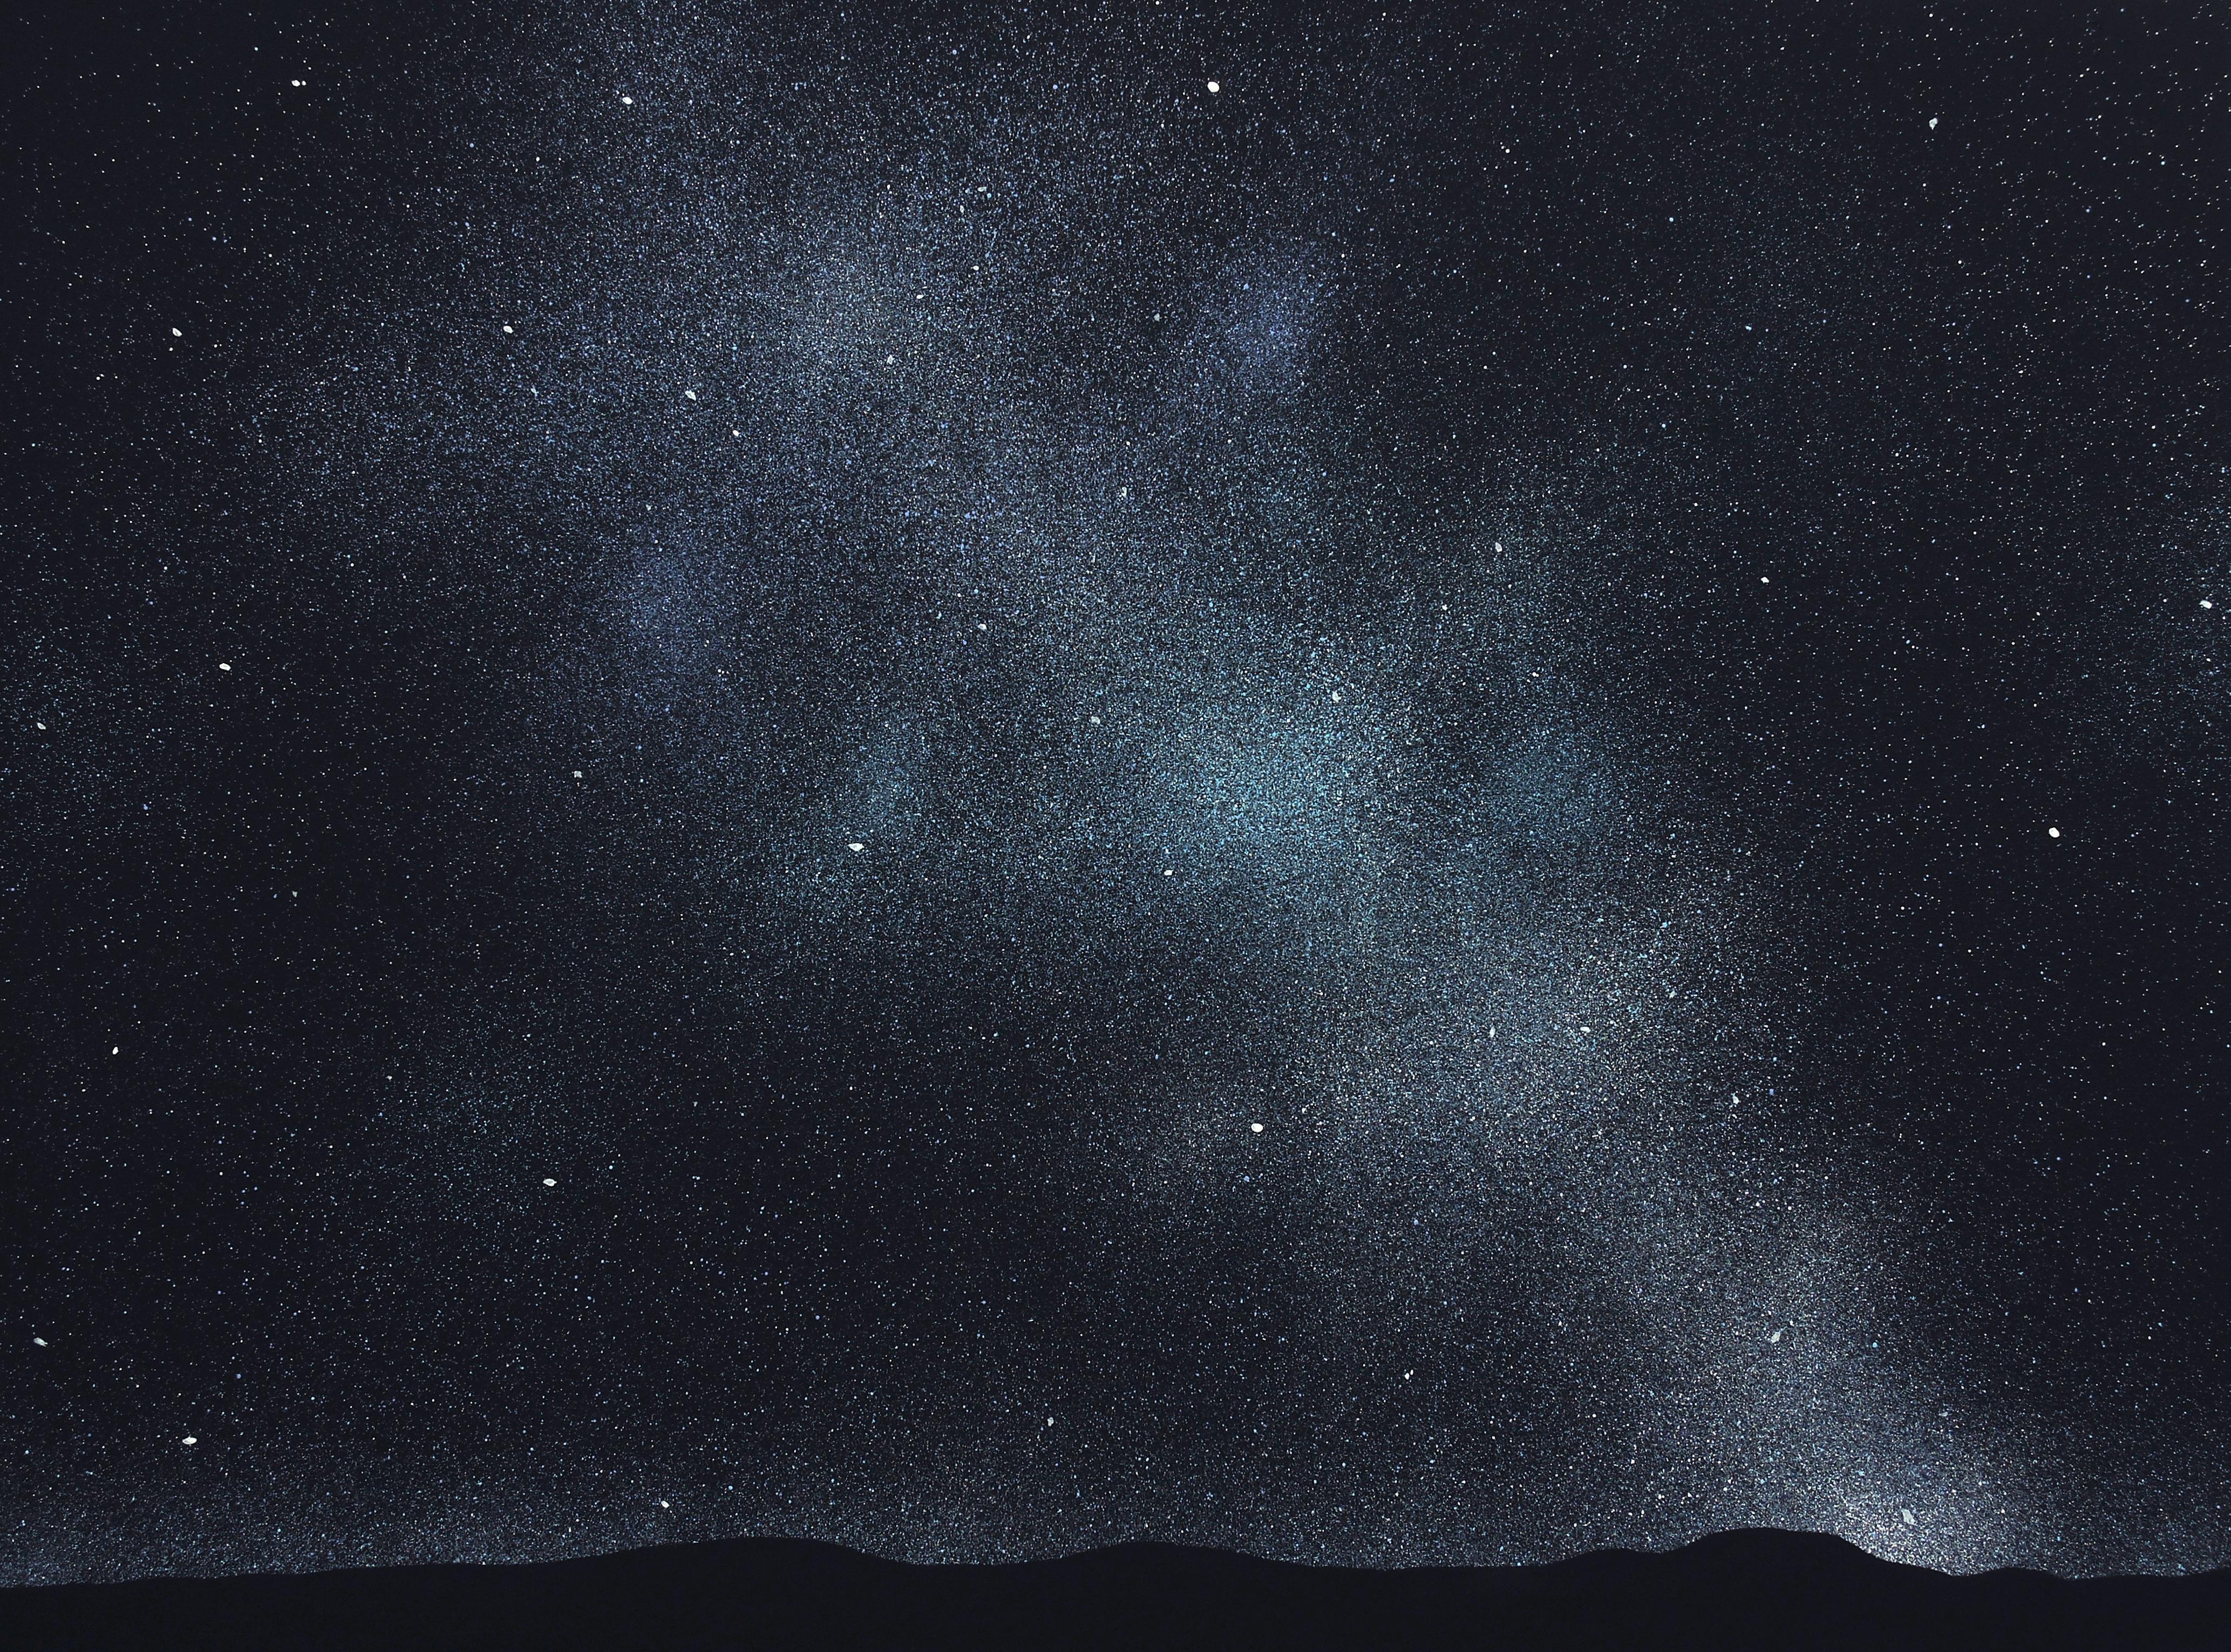 Stars 18 September 22:48, Modern Night Sky Landscape Painting, Minimalist Art